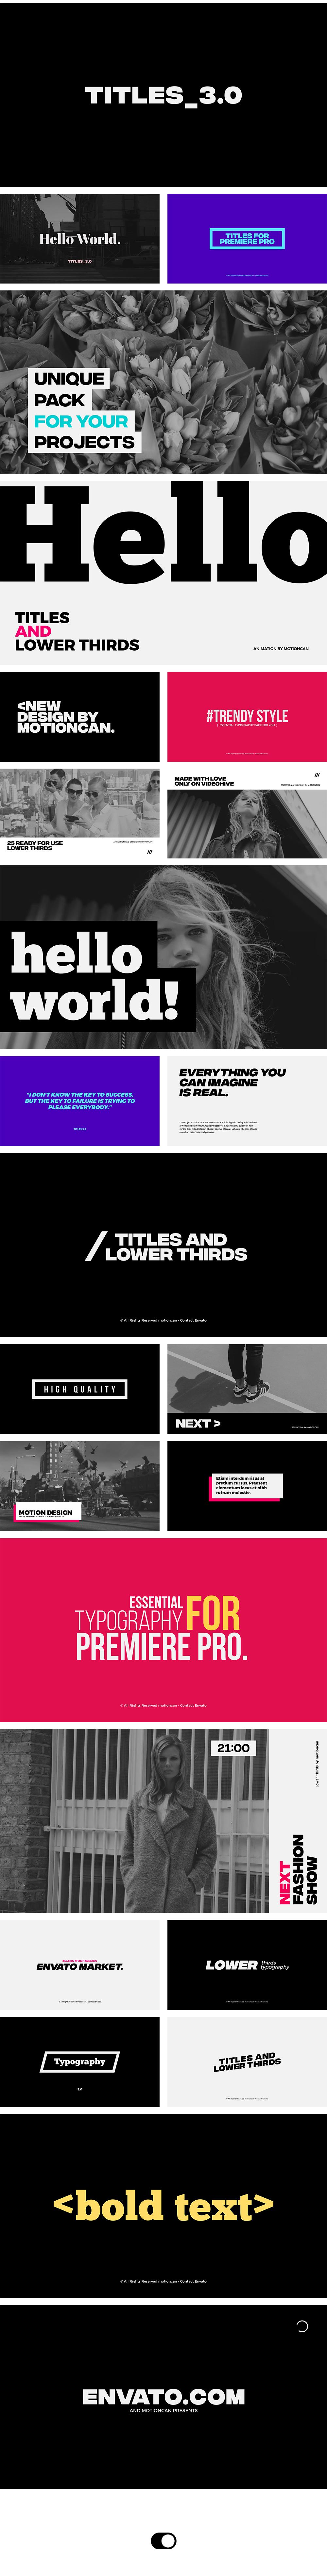 Titles - 3